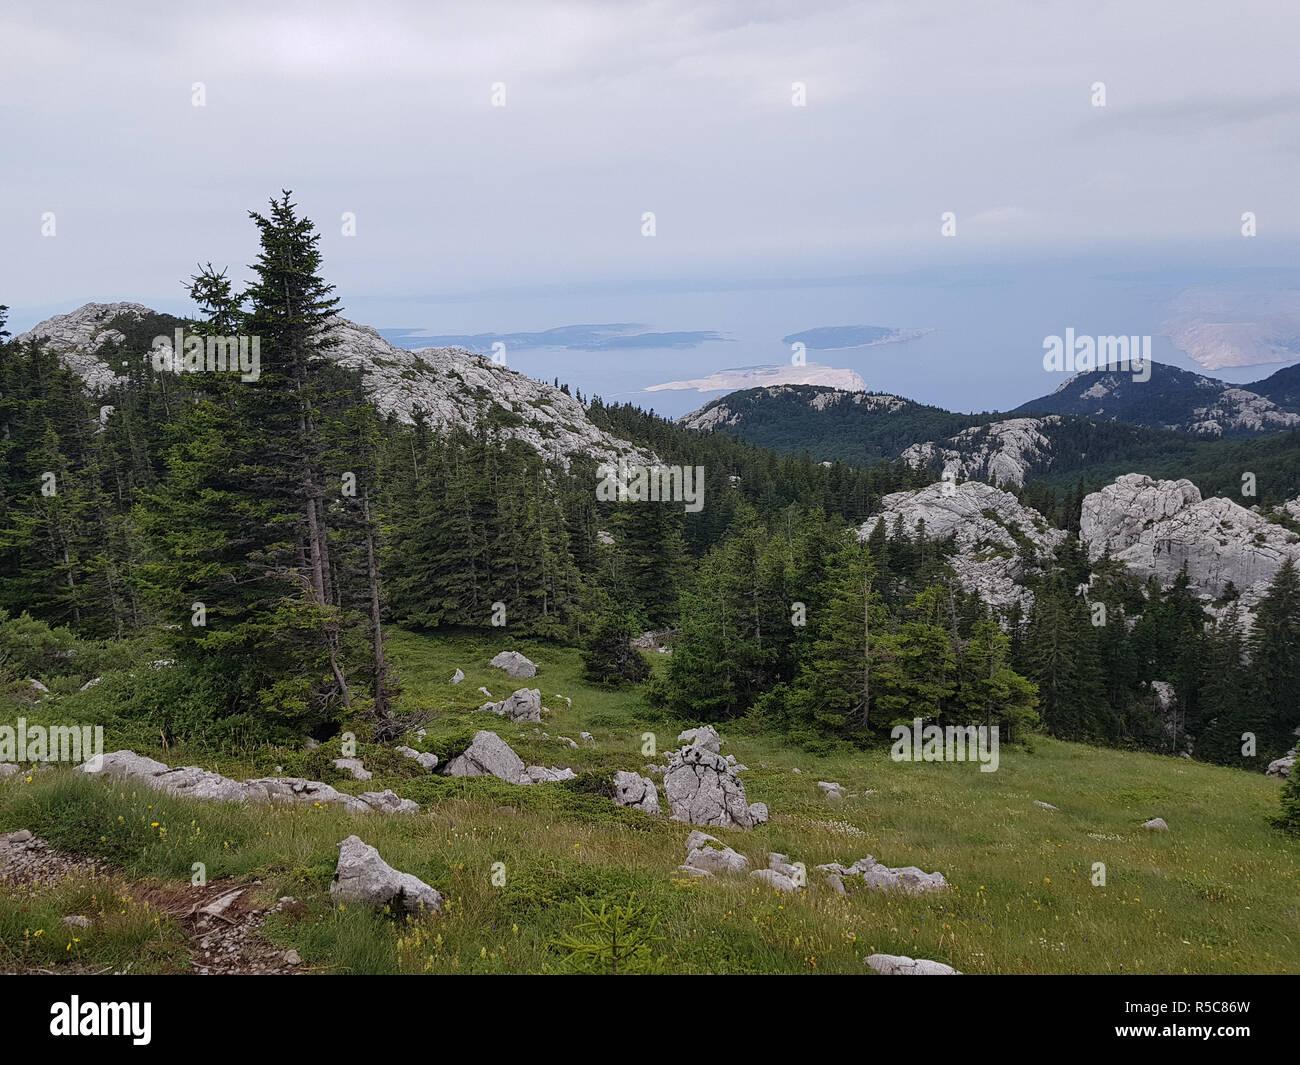 Premuzic mountain trail, Northern Velebit National Park, Croatia Stock Photo